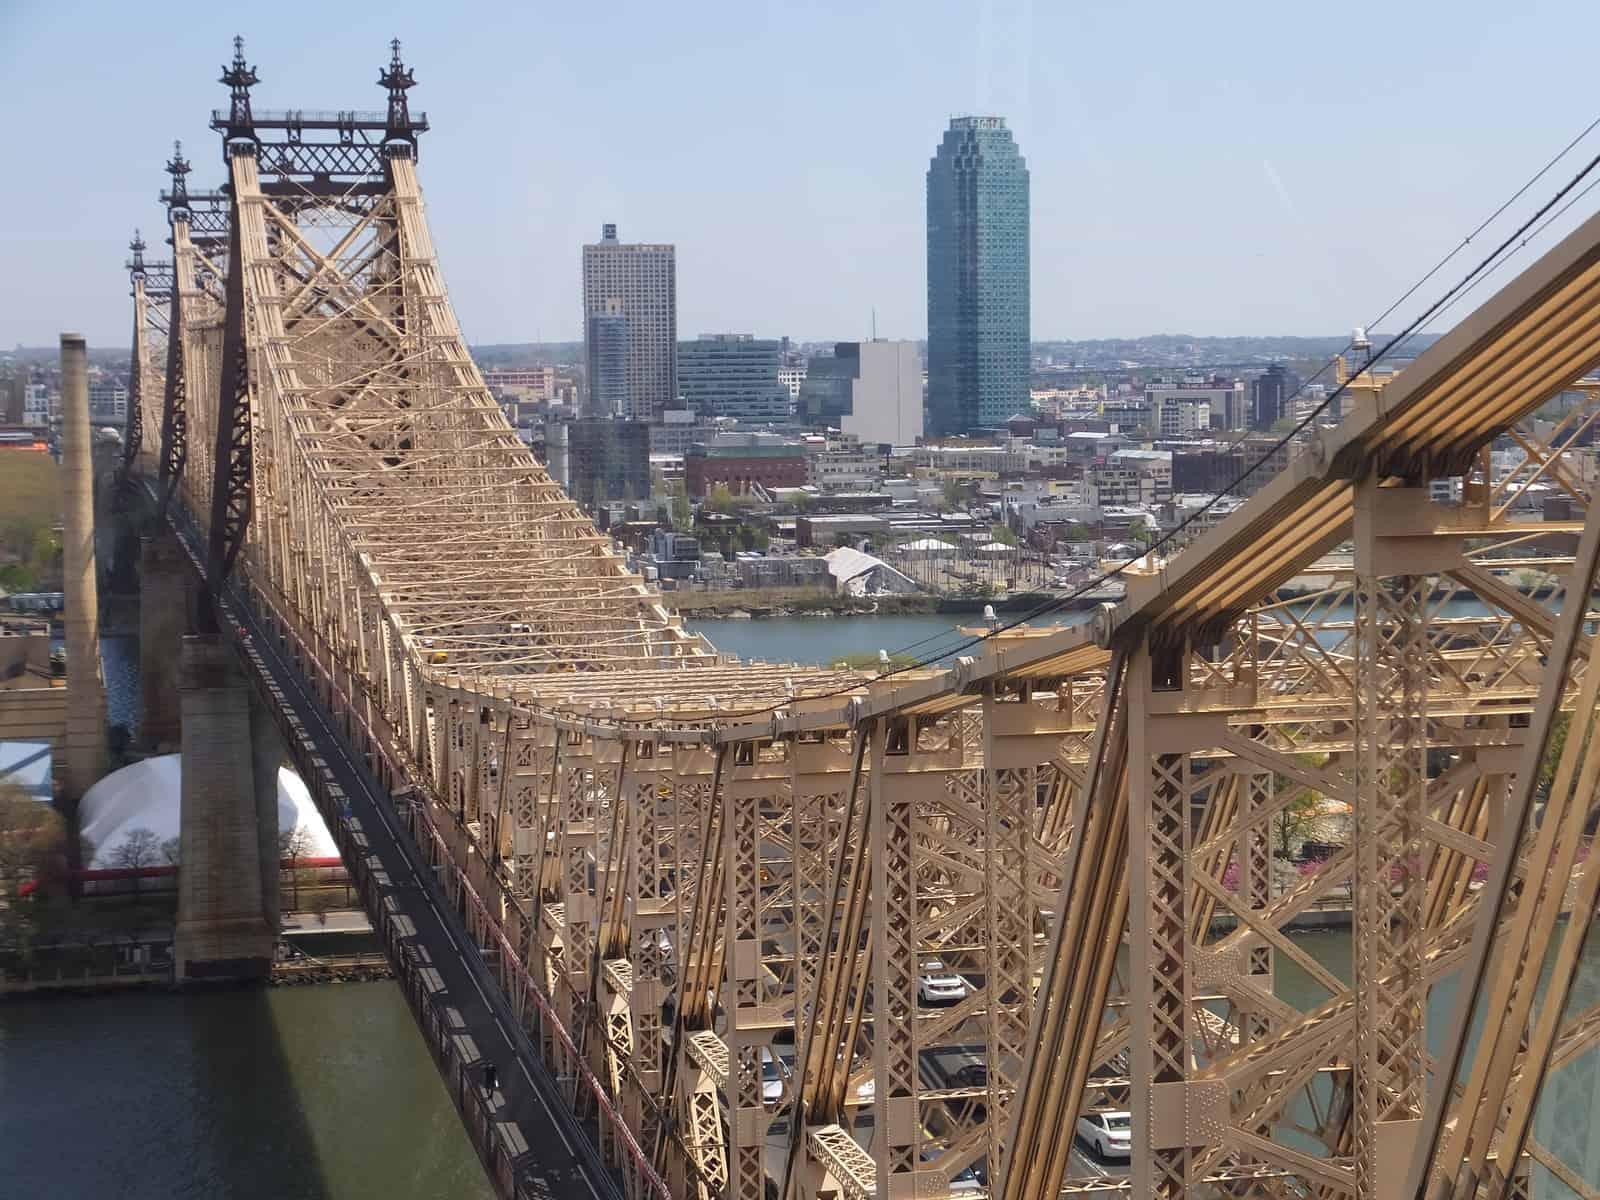 Hillcrest Queens, New York Private Investigator